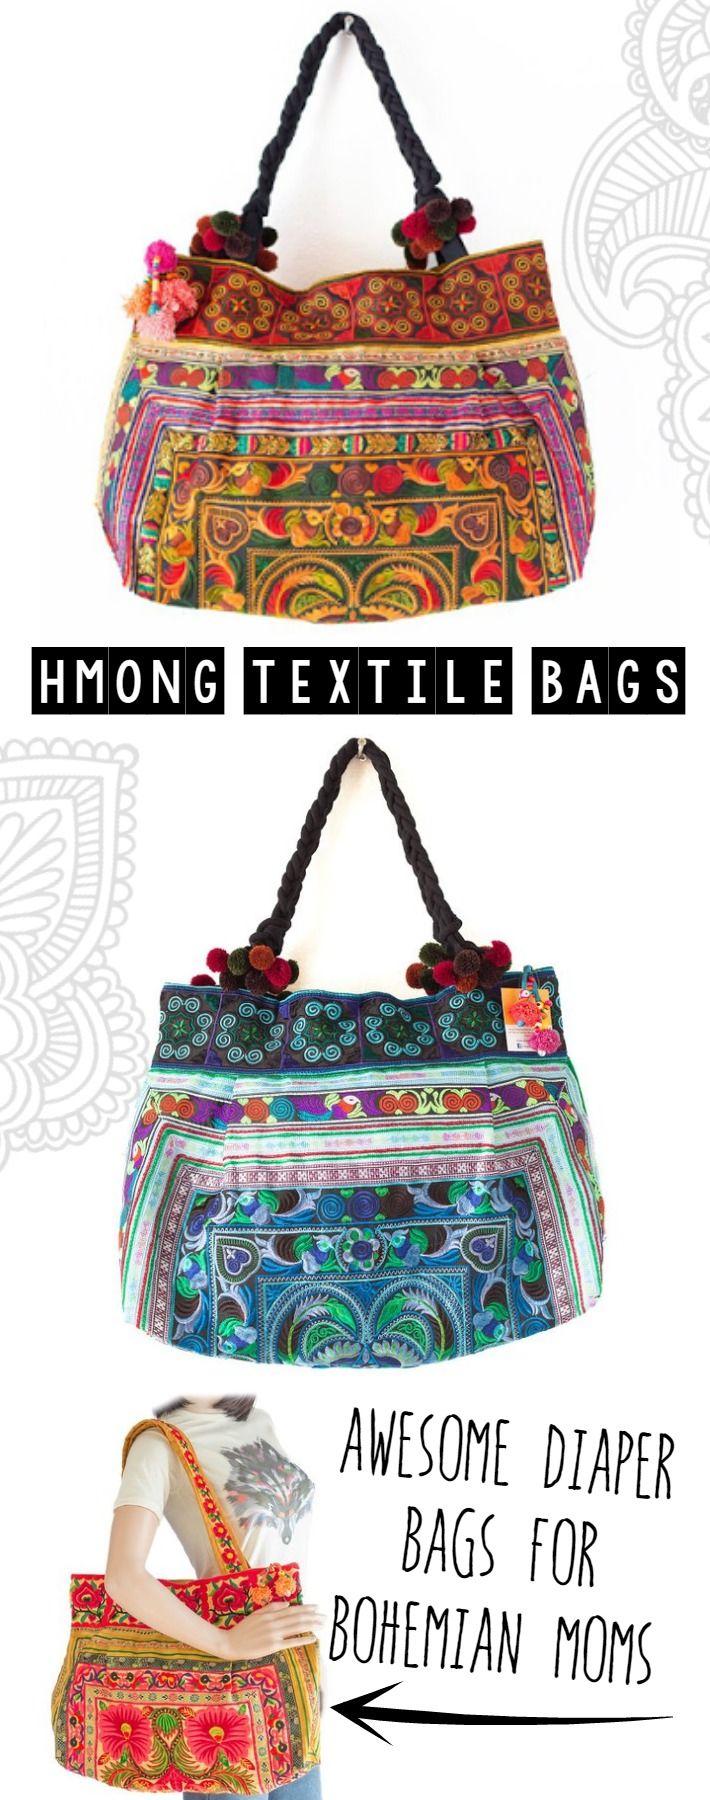 Hmong Textile Bohemian Mom Bags {boho hippie diaper bags under $40}